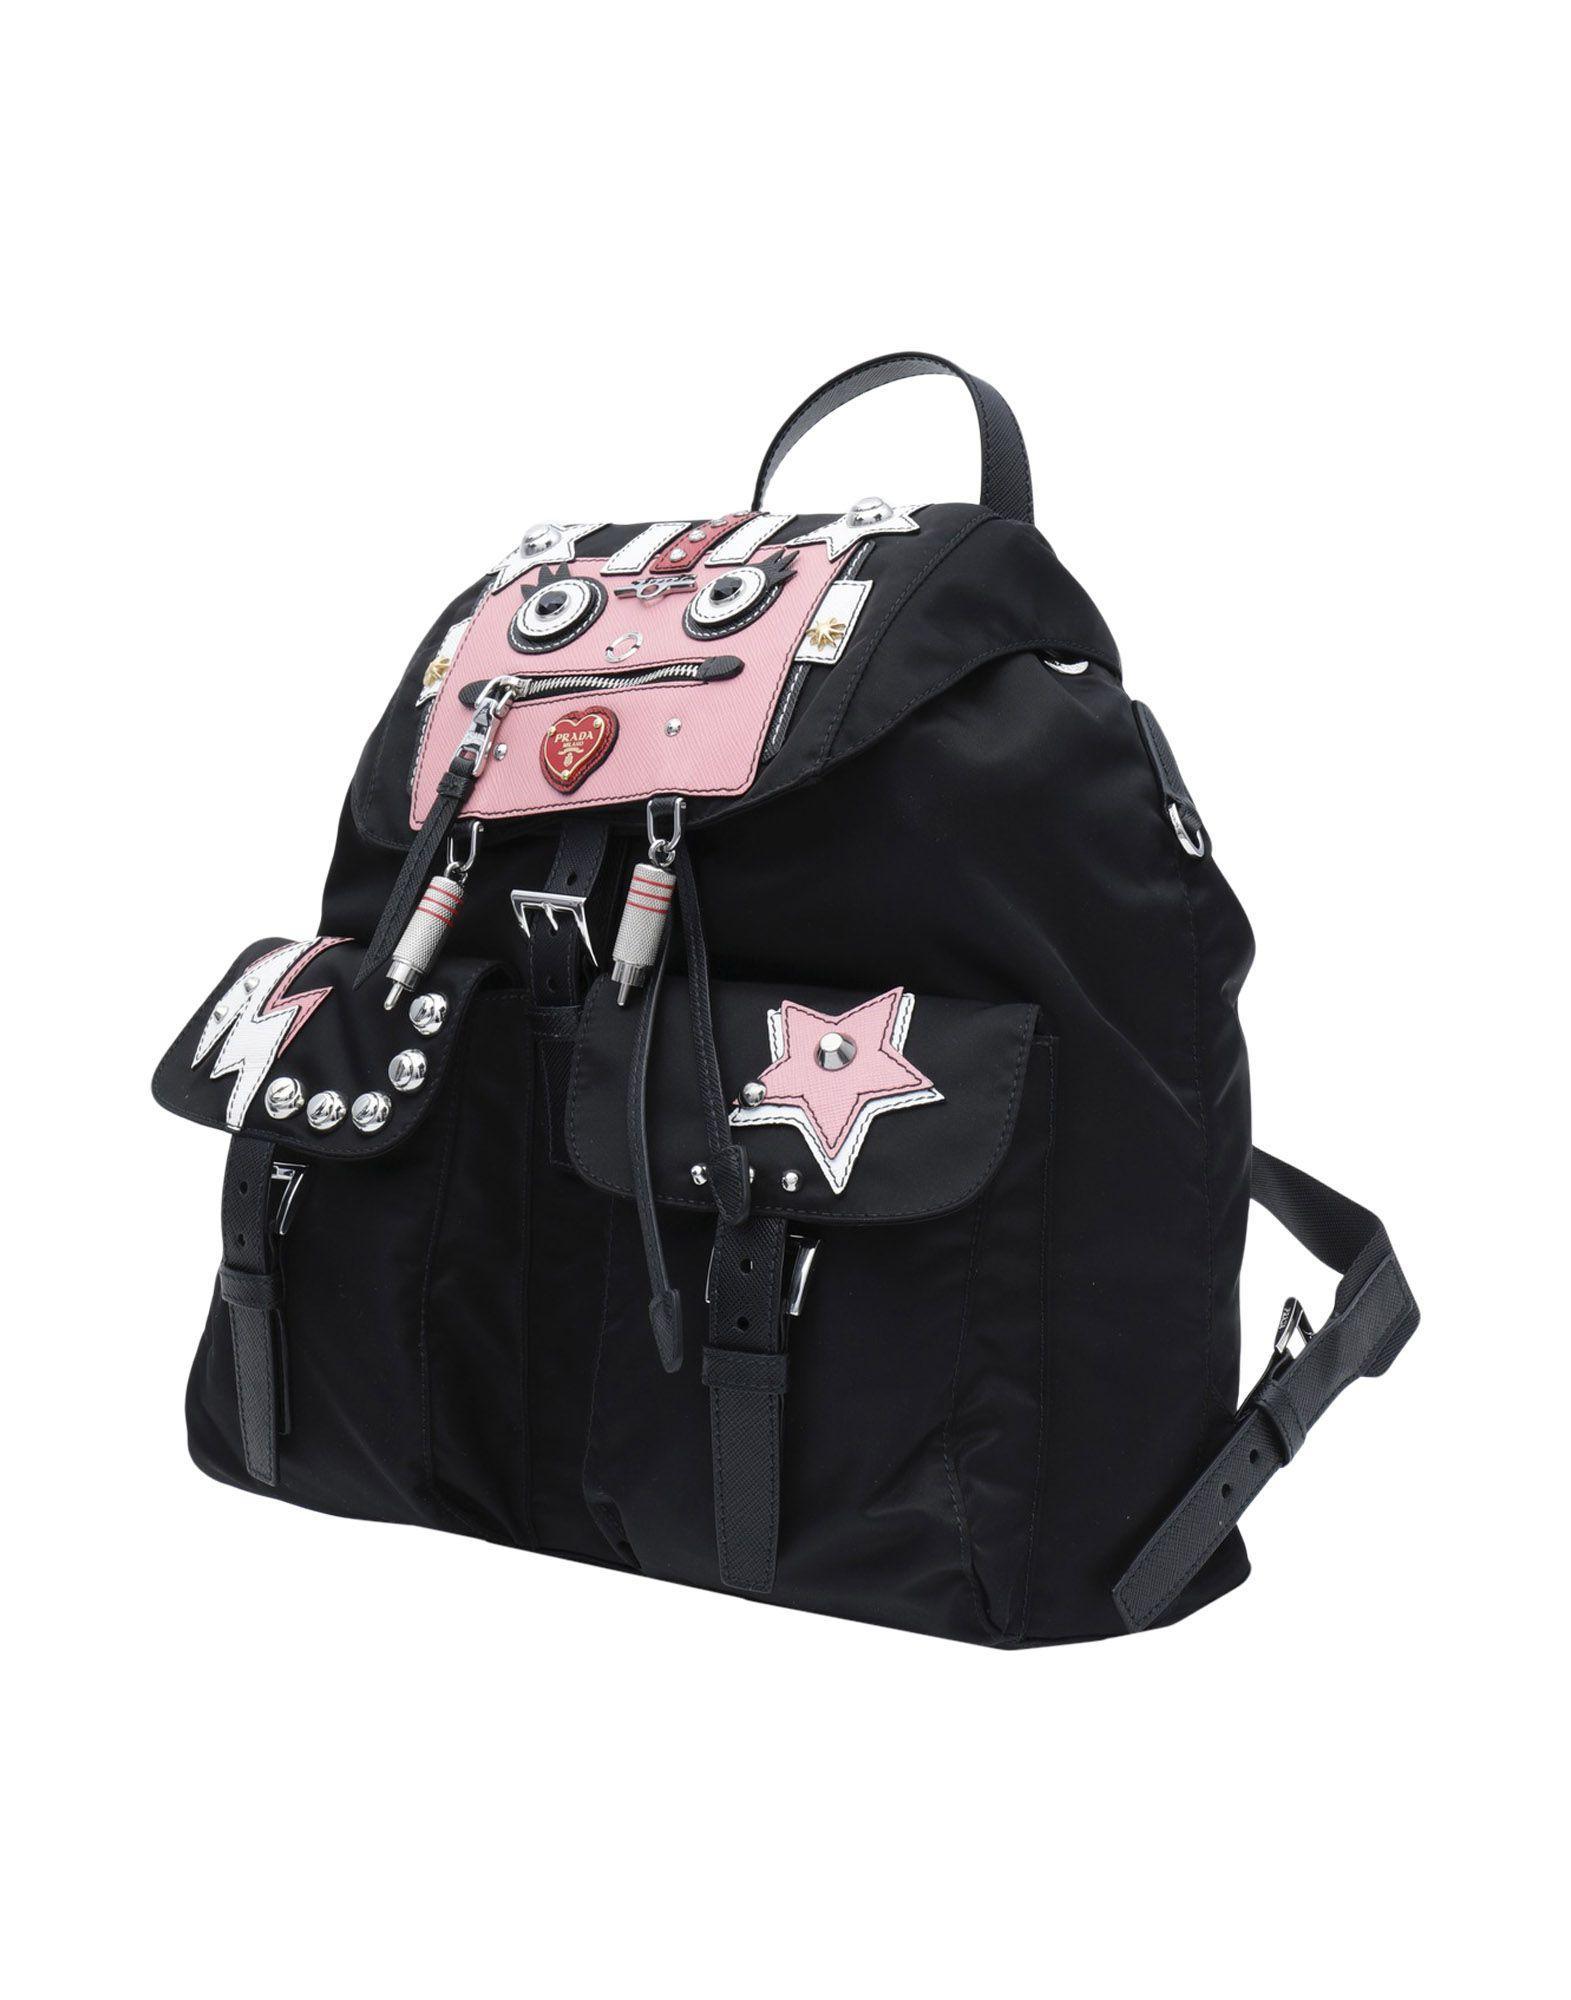 2e6b42f98d5c Prada - Black Backpacks   Bum Bags - Lyst. View fullscreen